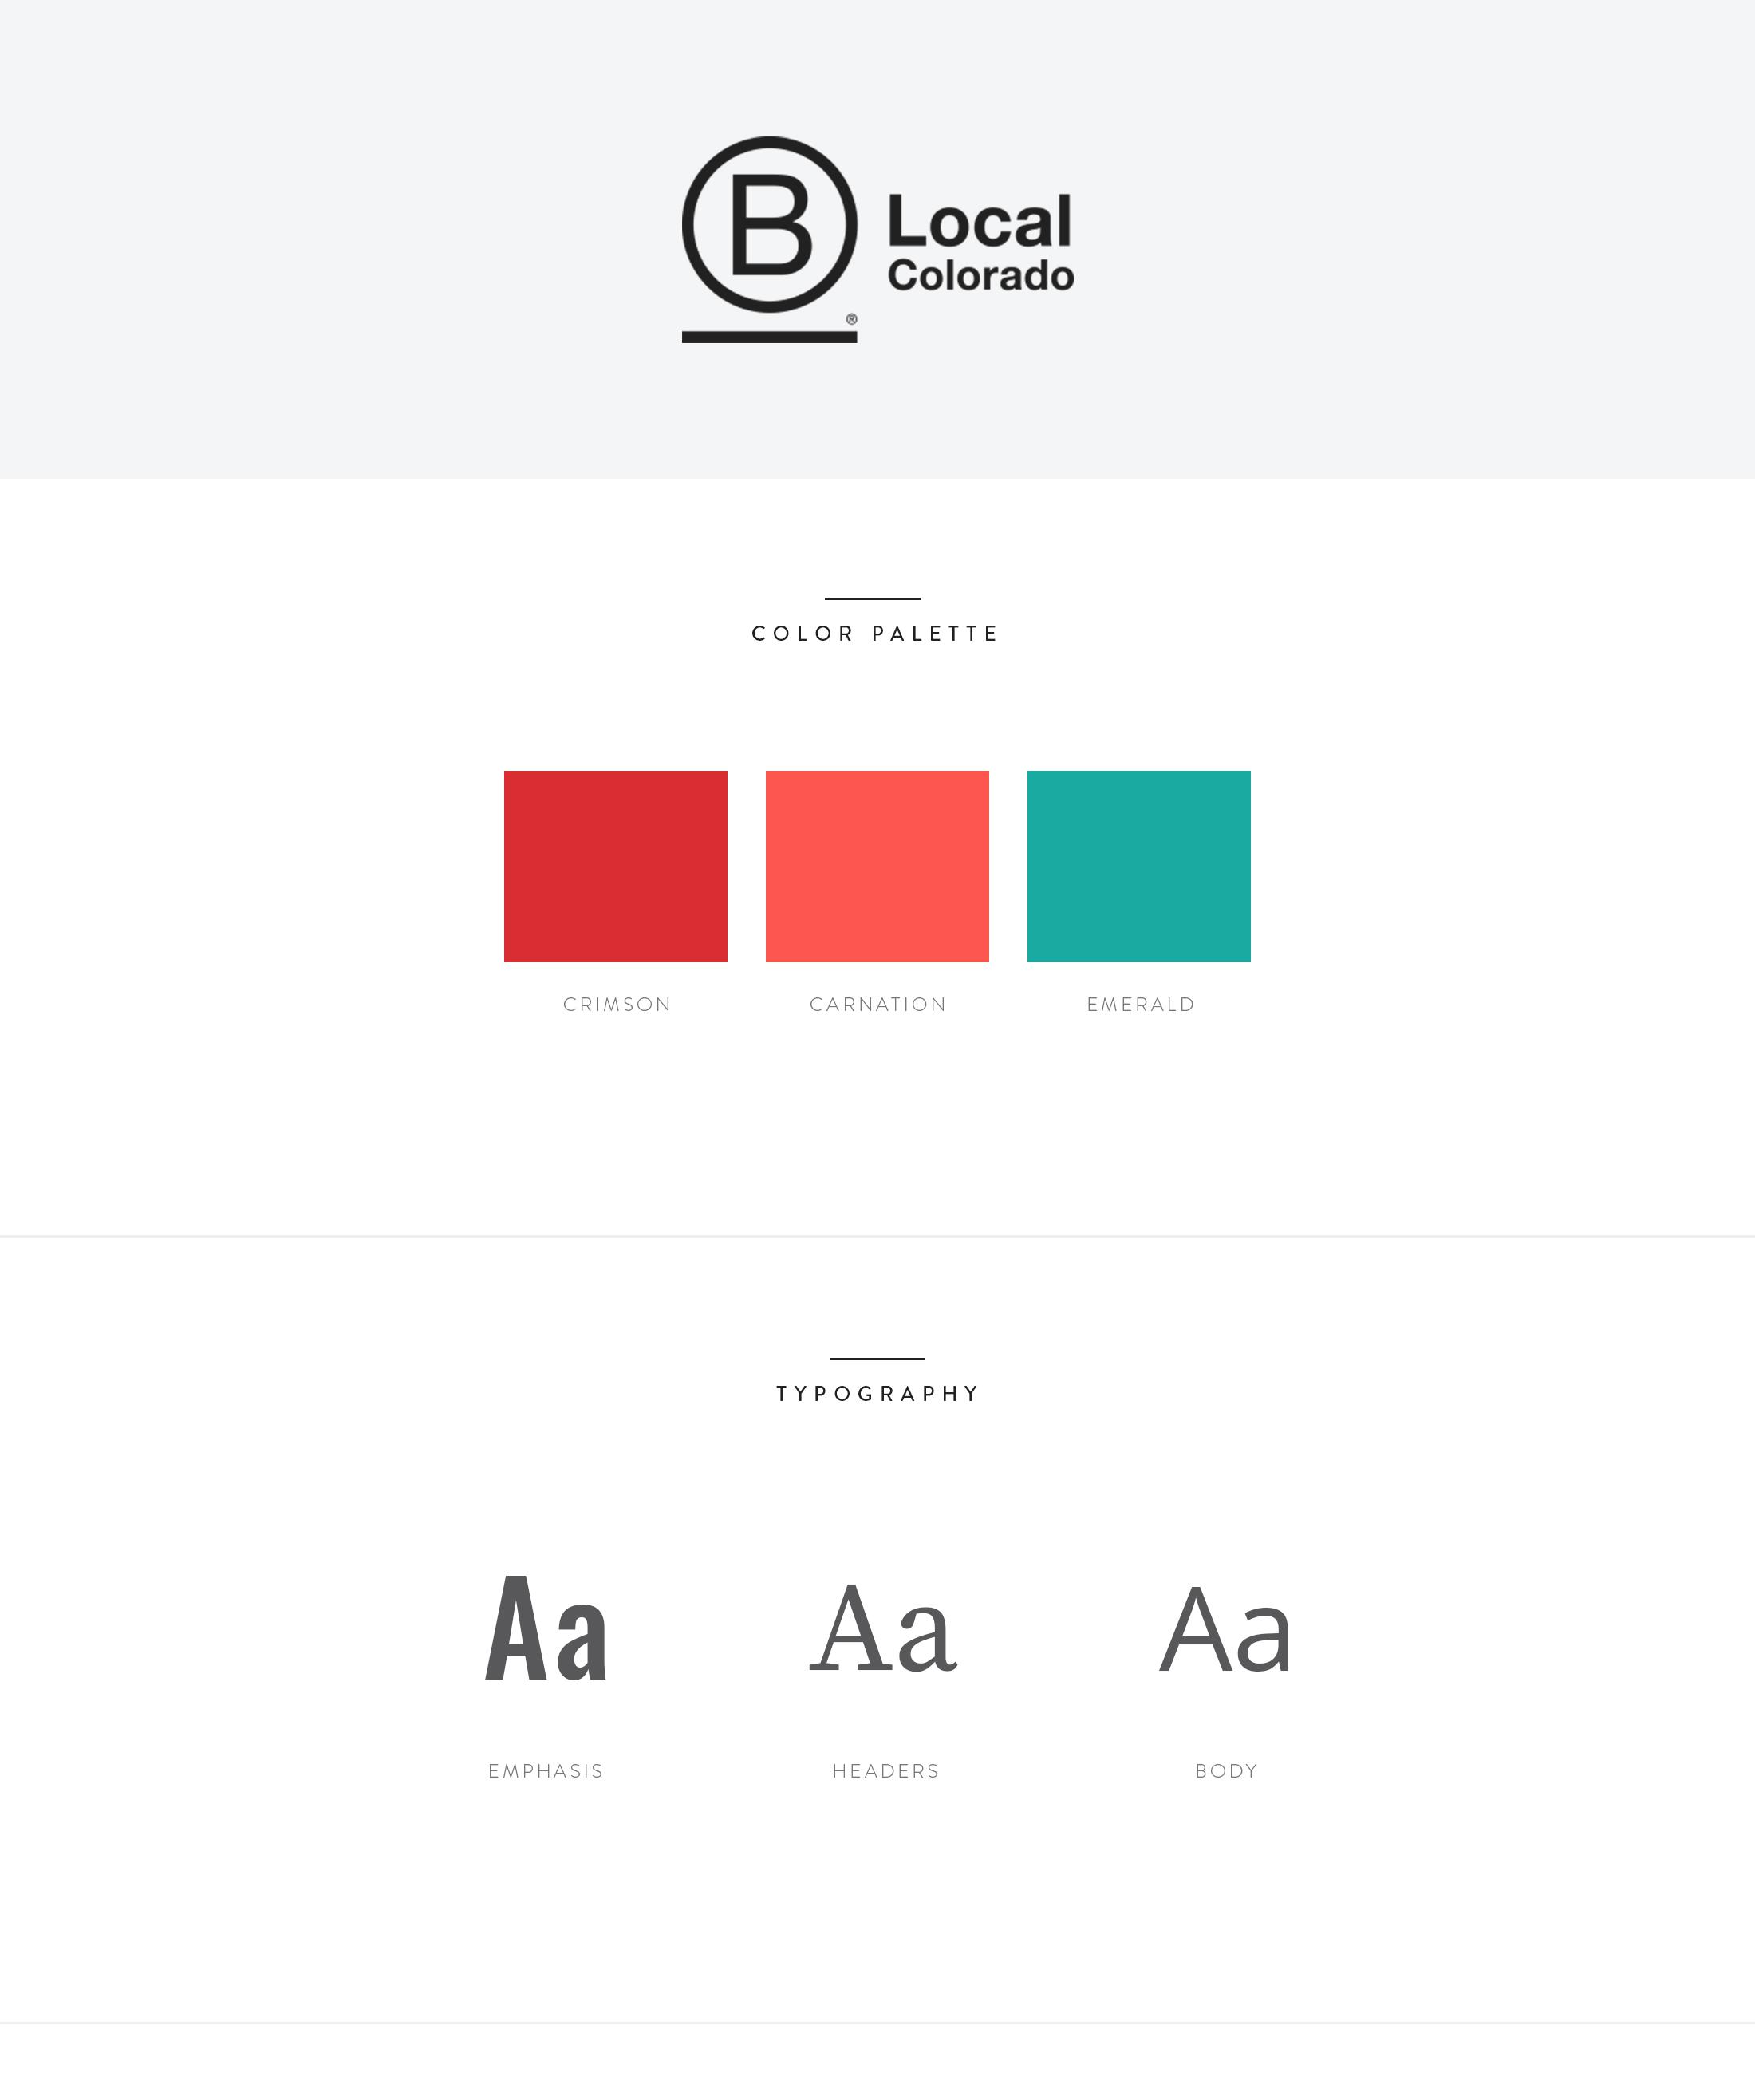 b-local-colorado-design.jpg